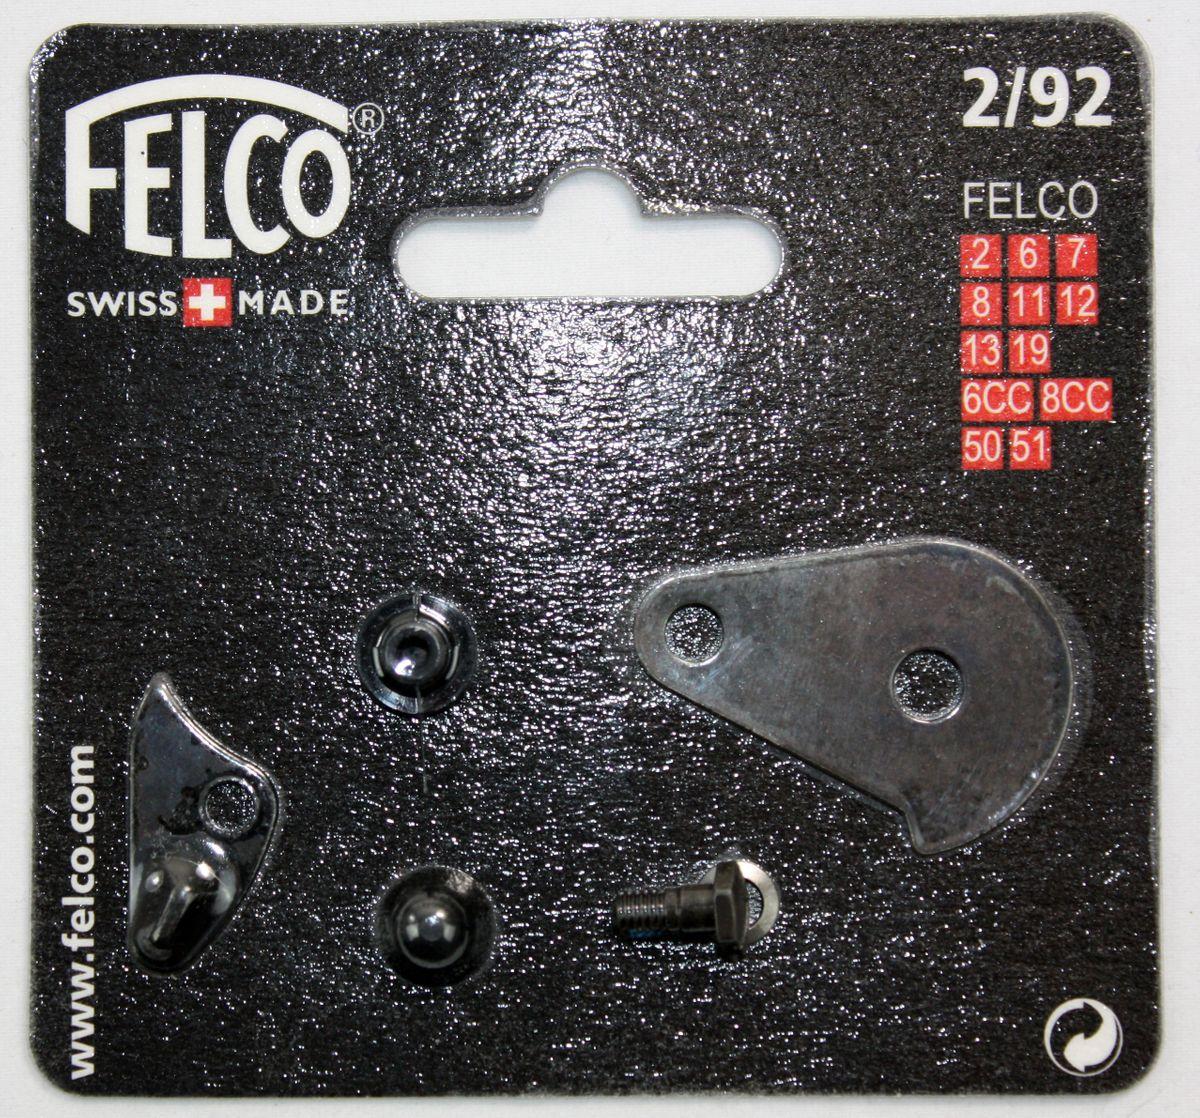 Felco Reparatur-Satz Verschlussklinke 2/92 – Bild 1